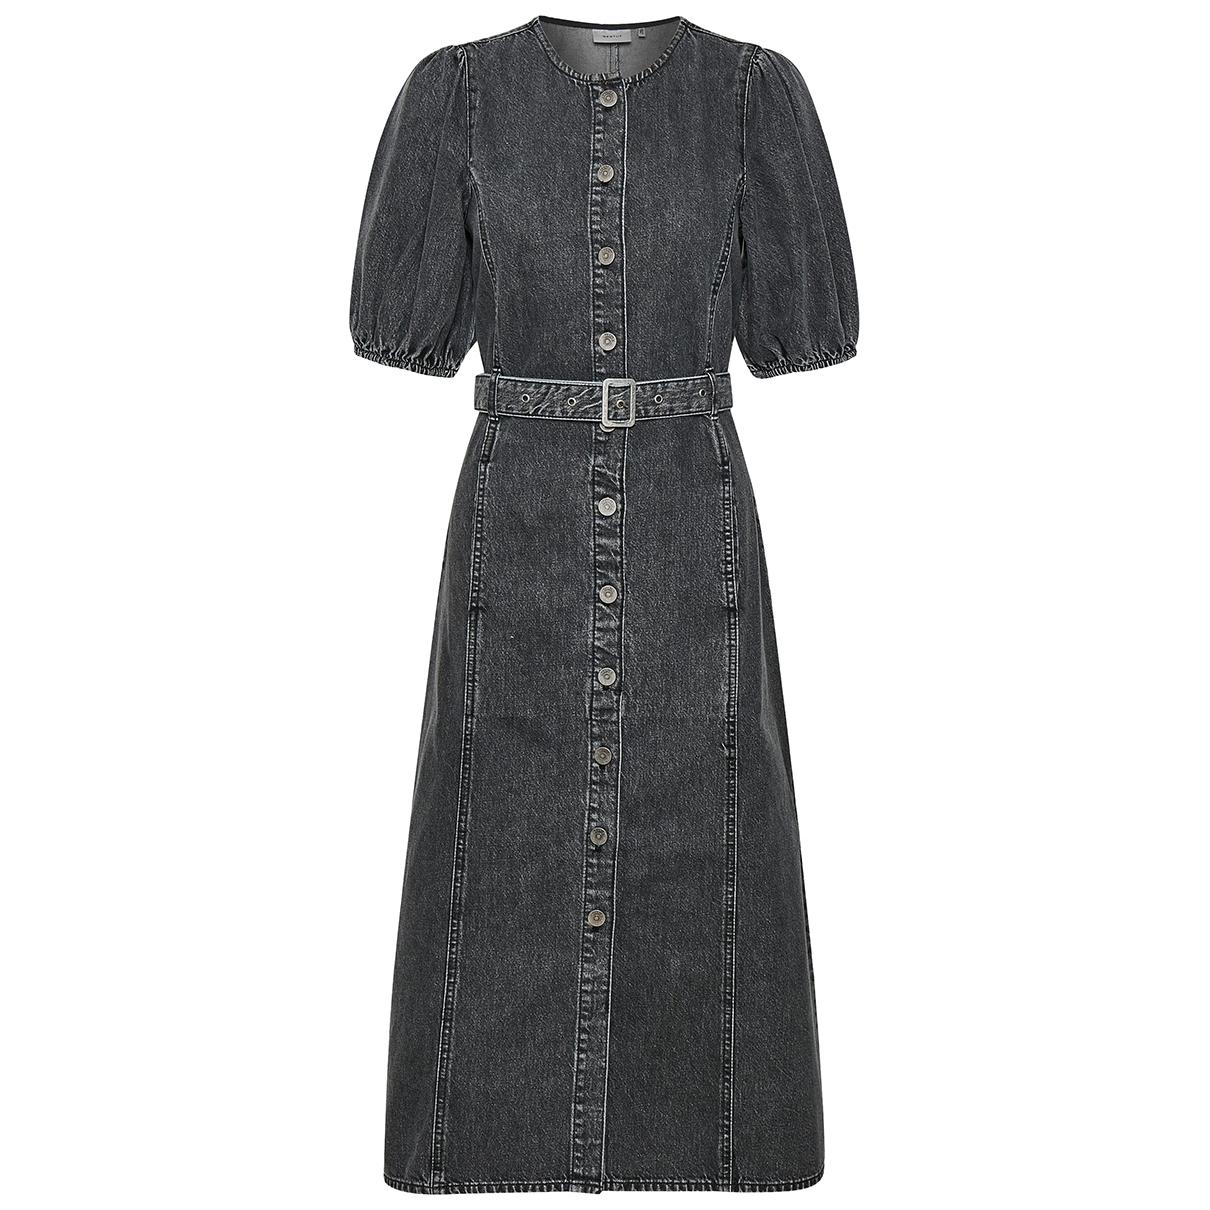 Gestuz \N Black Denim - Jeans dress for Women 10 UK